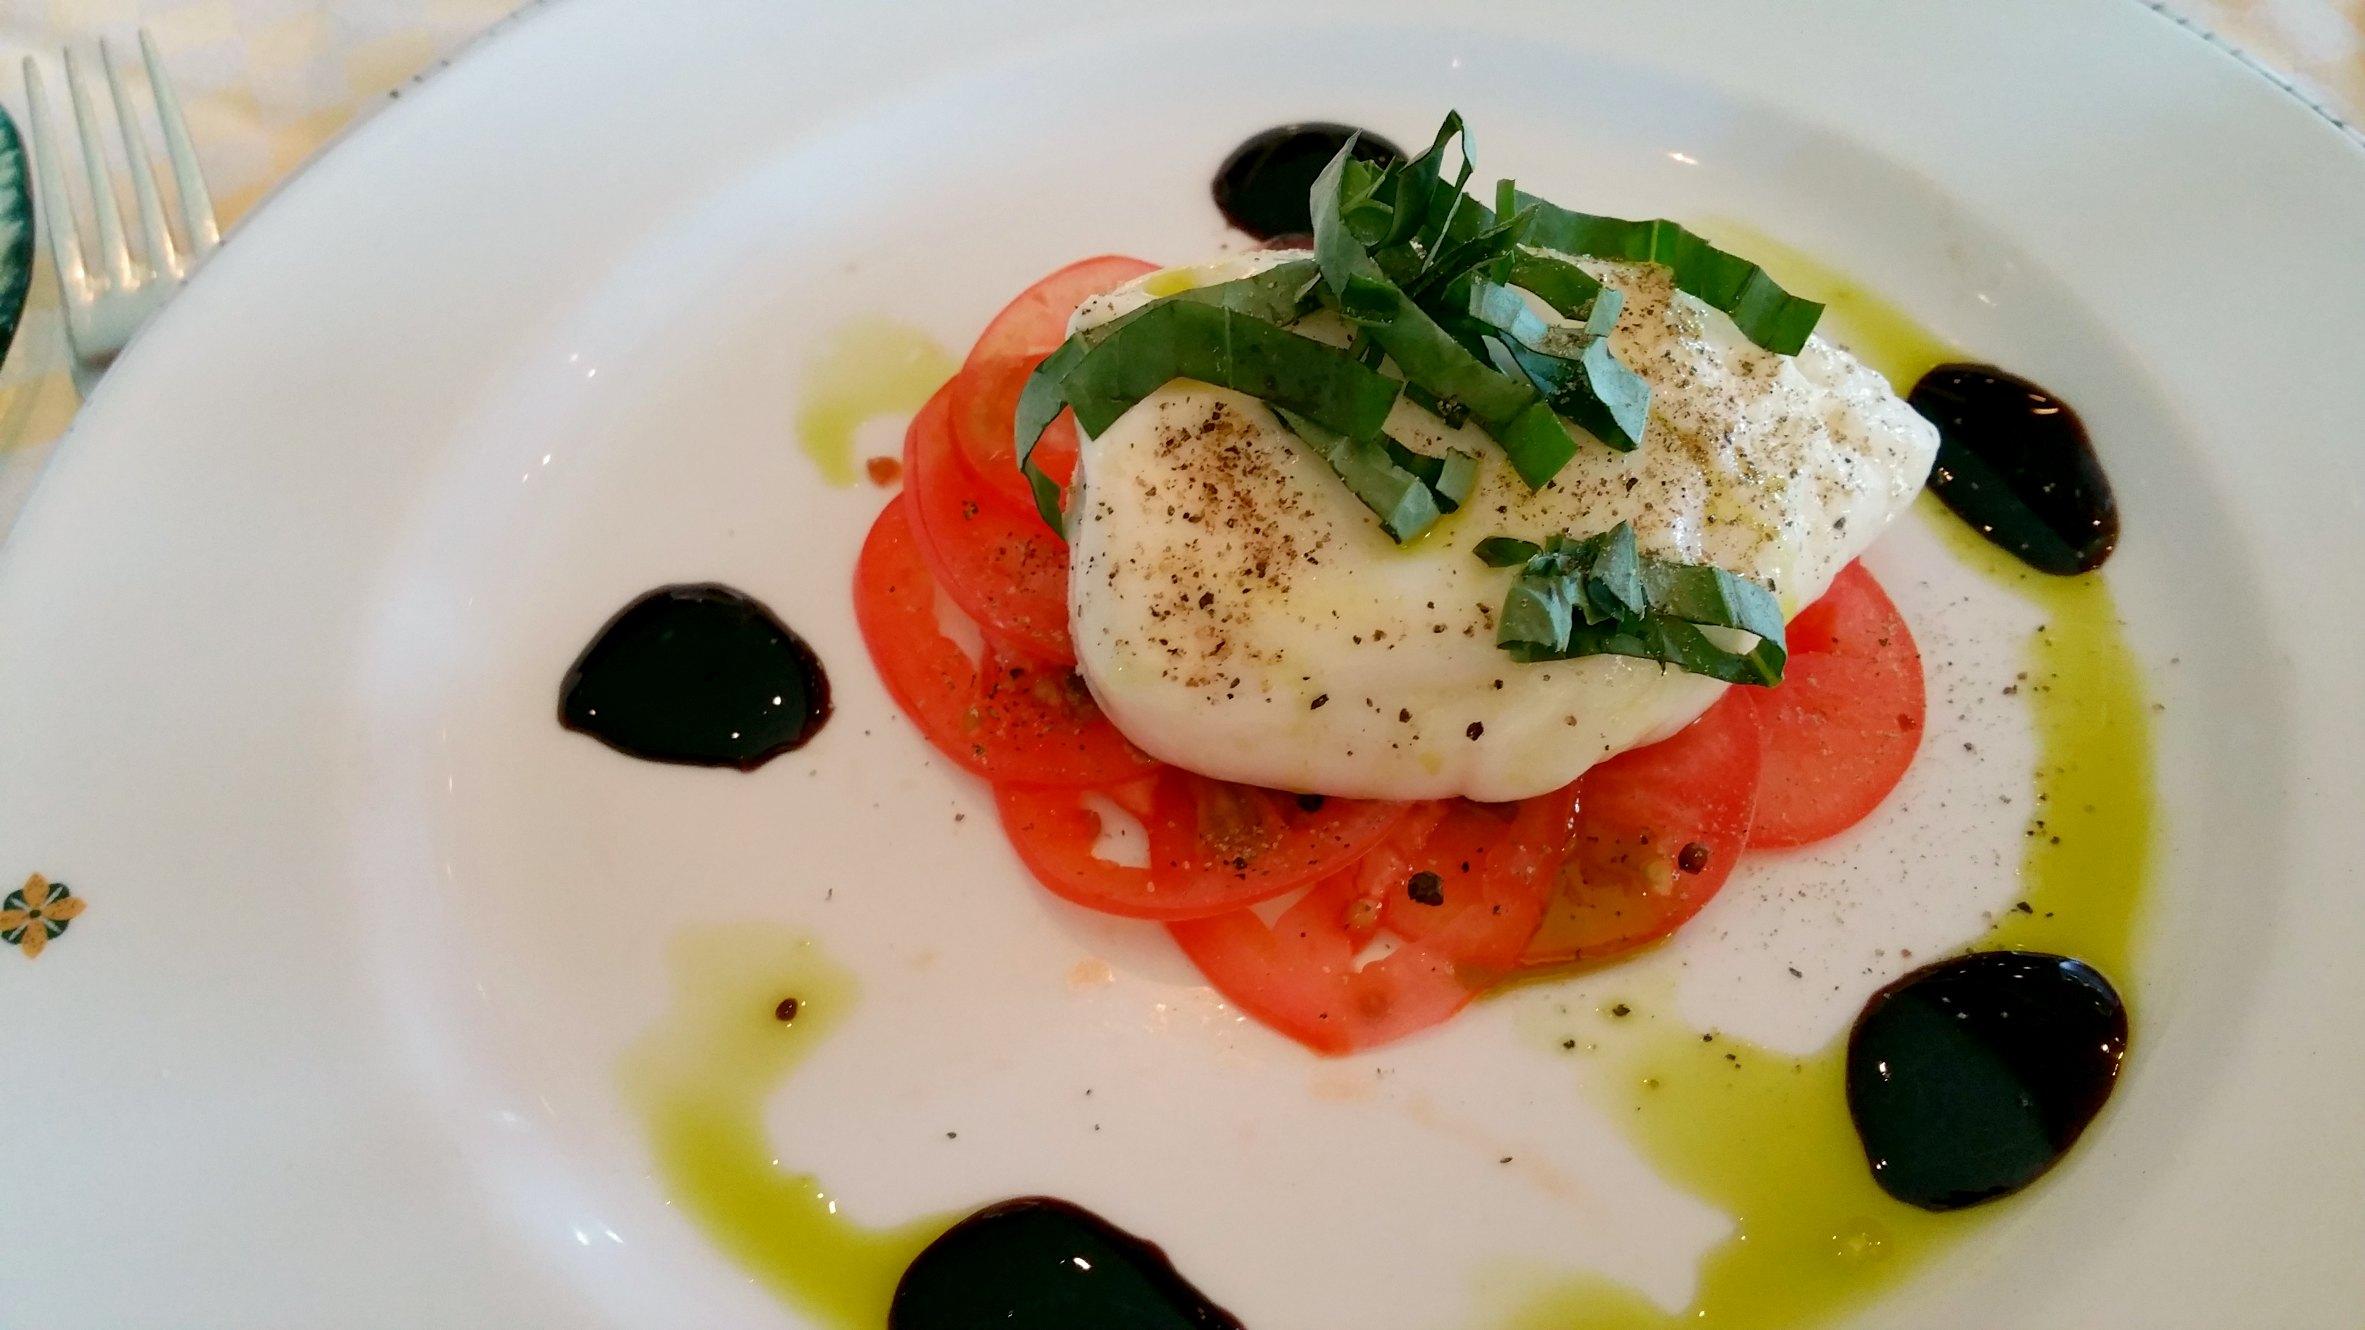 Sabatini's crown princess mozzarella salad